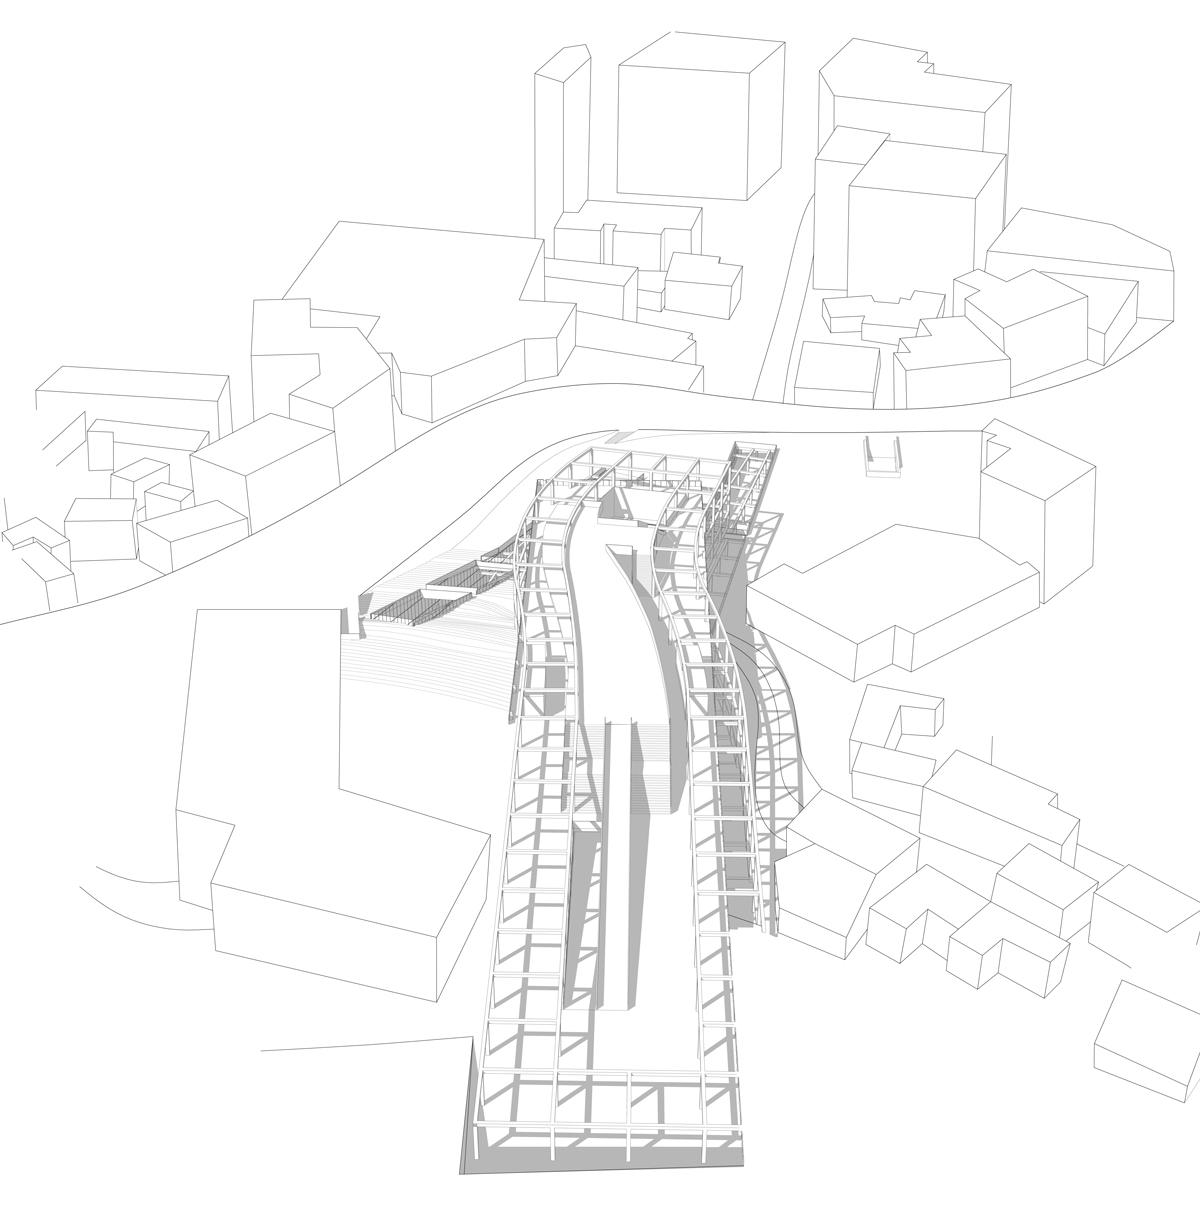 Degli-Esposti-Architetti-Seoul-Animation -Center_07